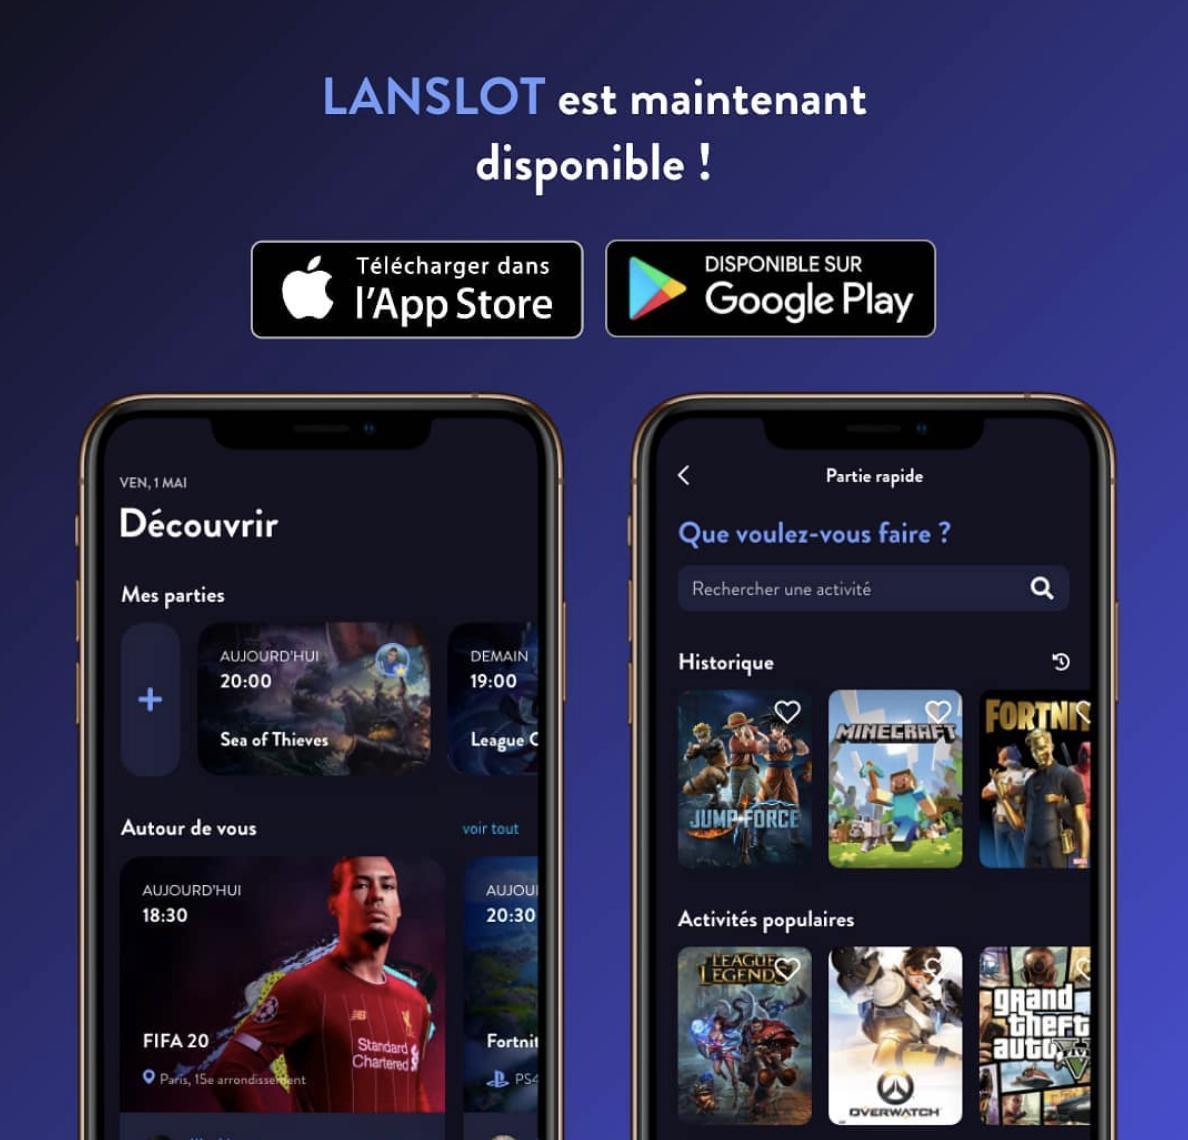 Laslot app